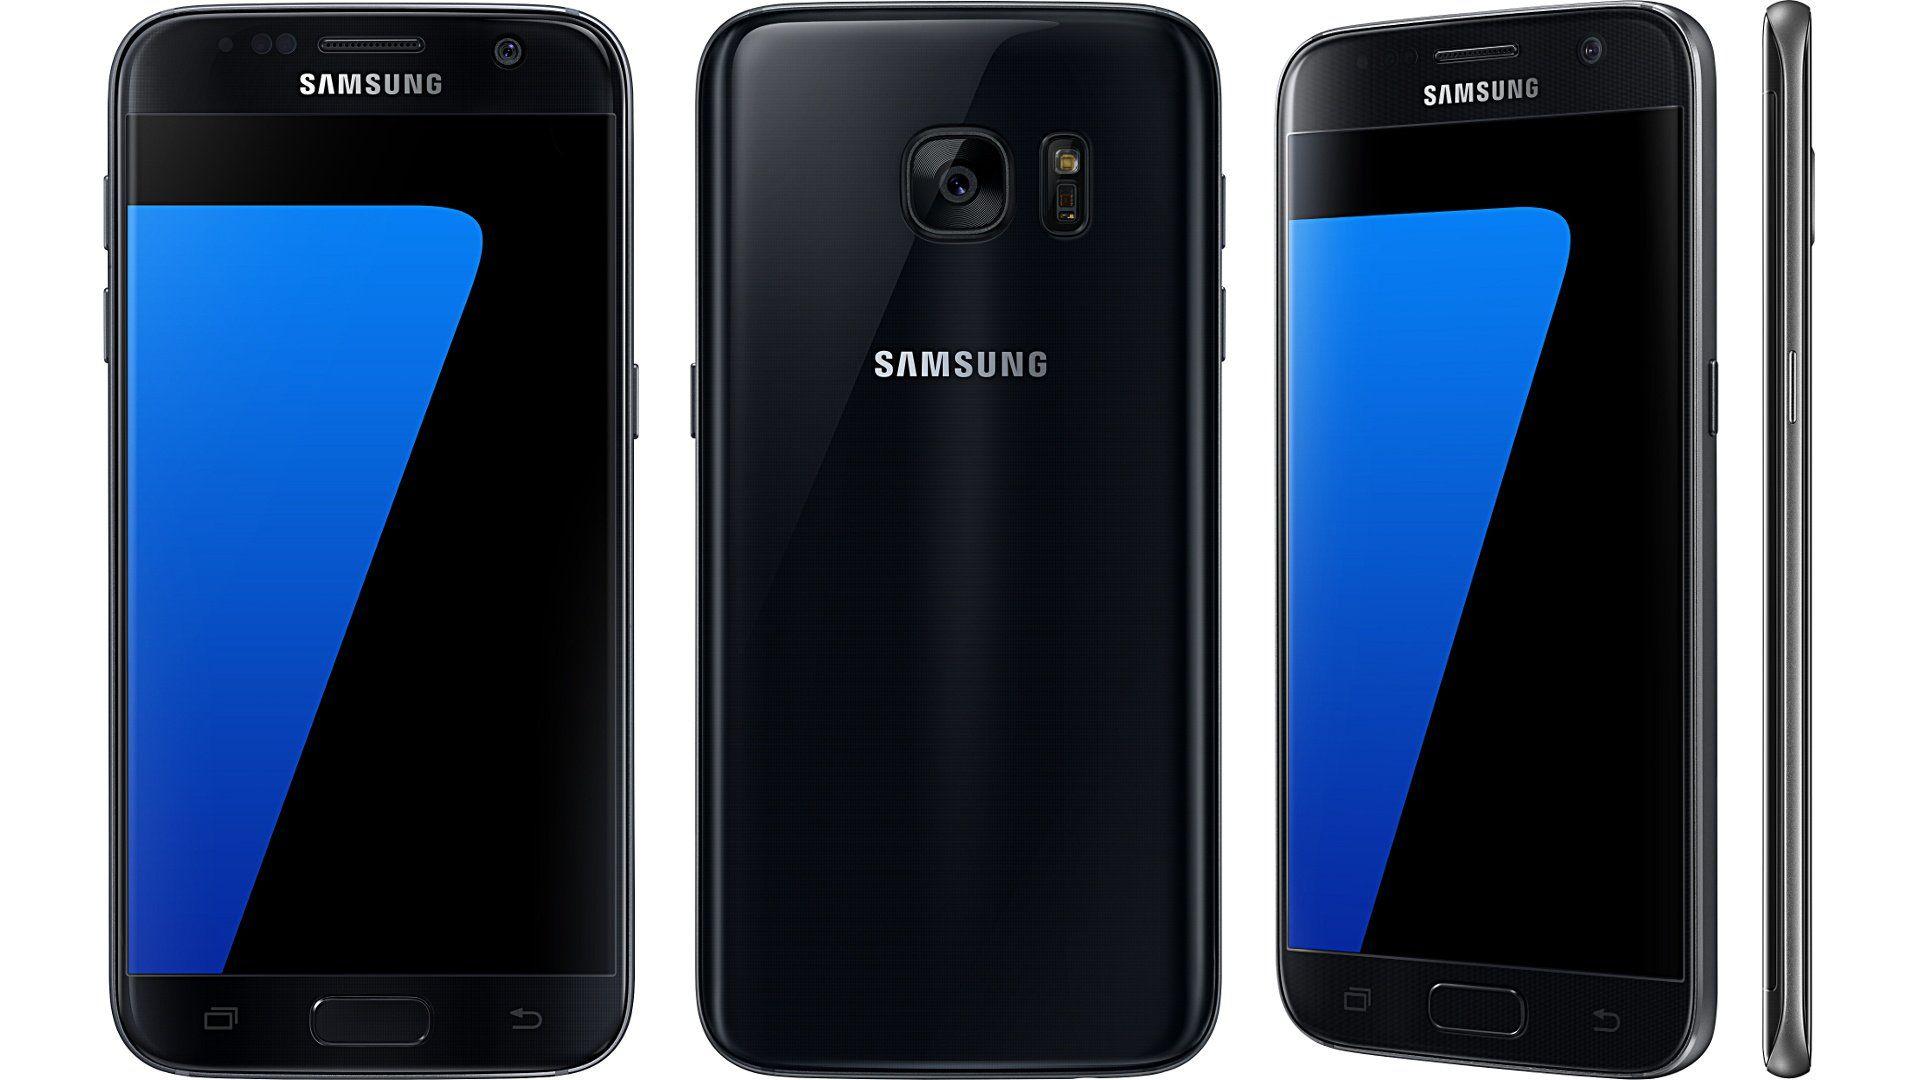 SMARTFON SAMSUNG GALAXY S7 SM-G930F 32GB CZARNY (MatrixMedia.pl - Black Friday)